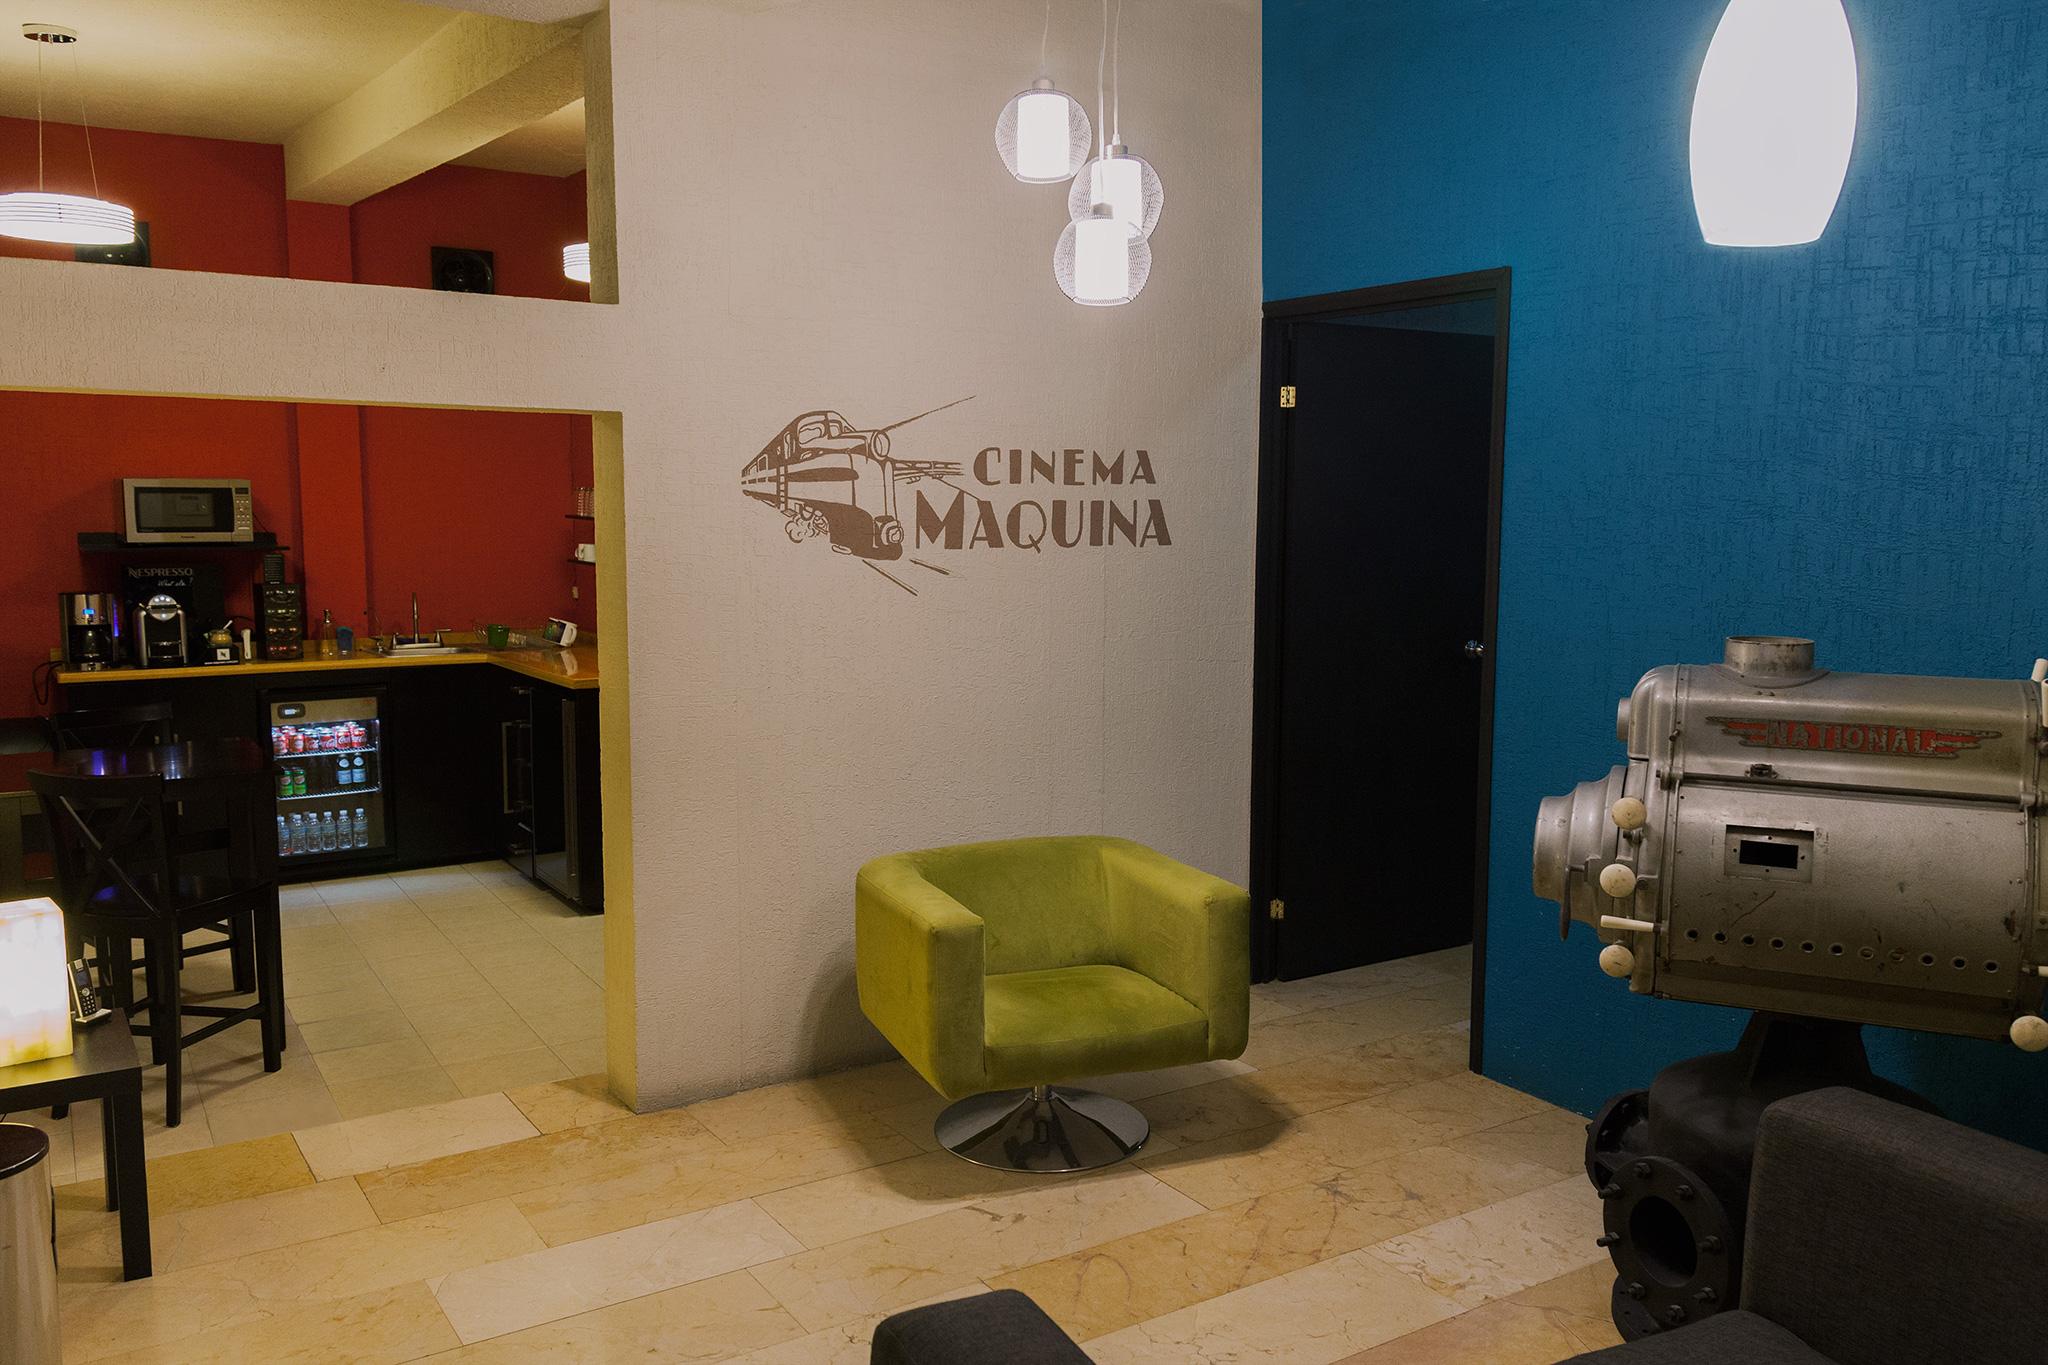 Cinema máquina. Amenidades